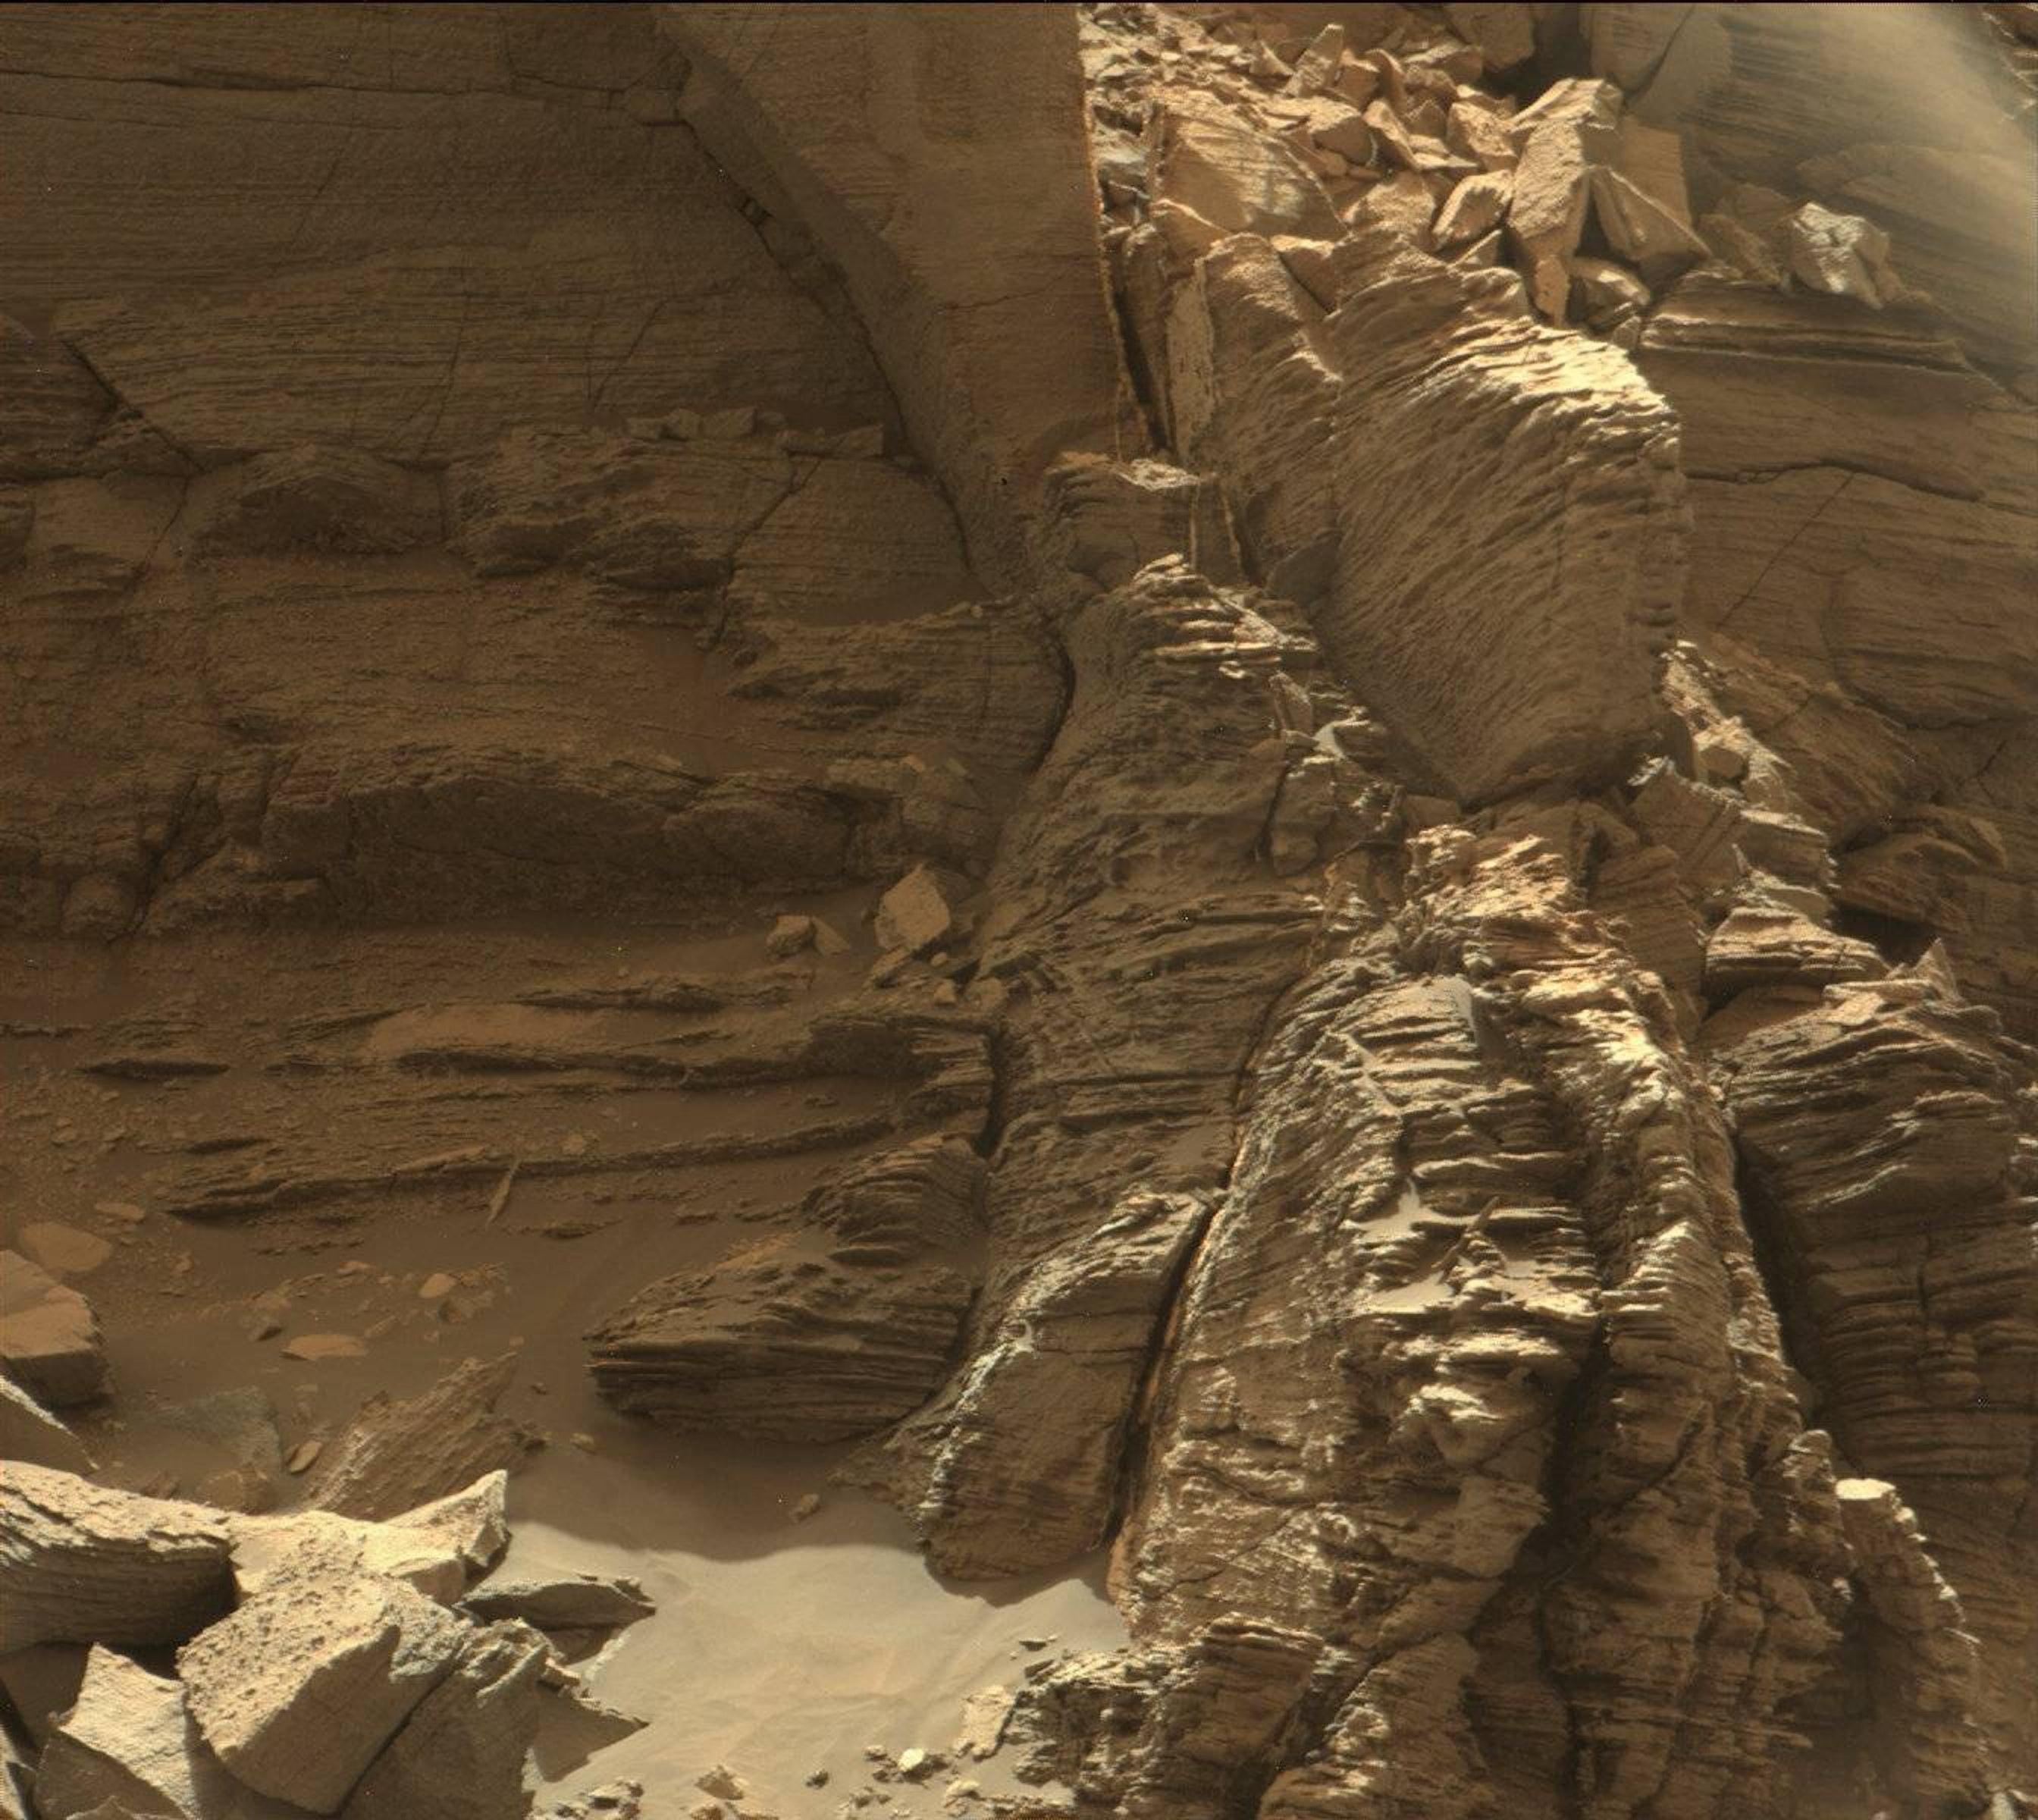 mars canyon nasa - photo #37